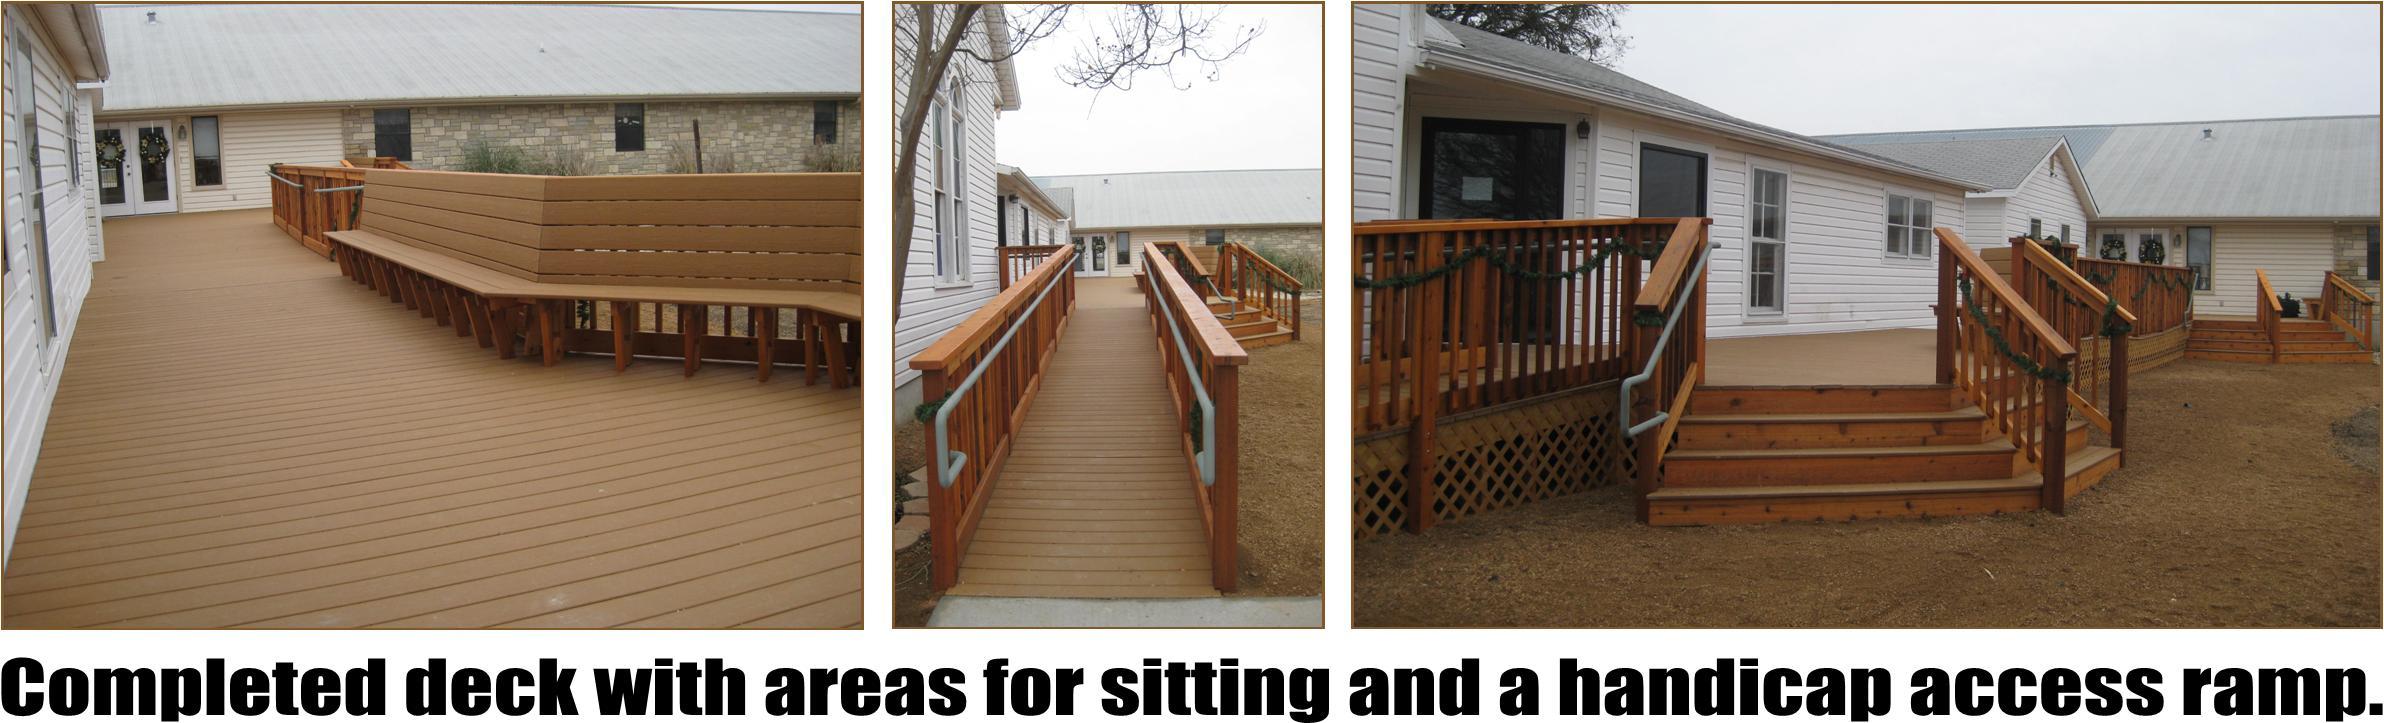 Deck Pictures